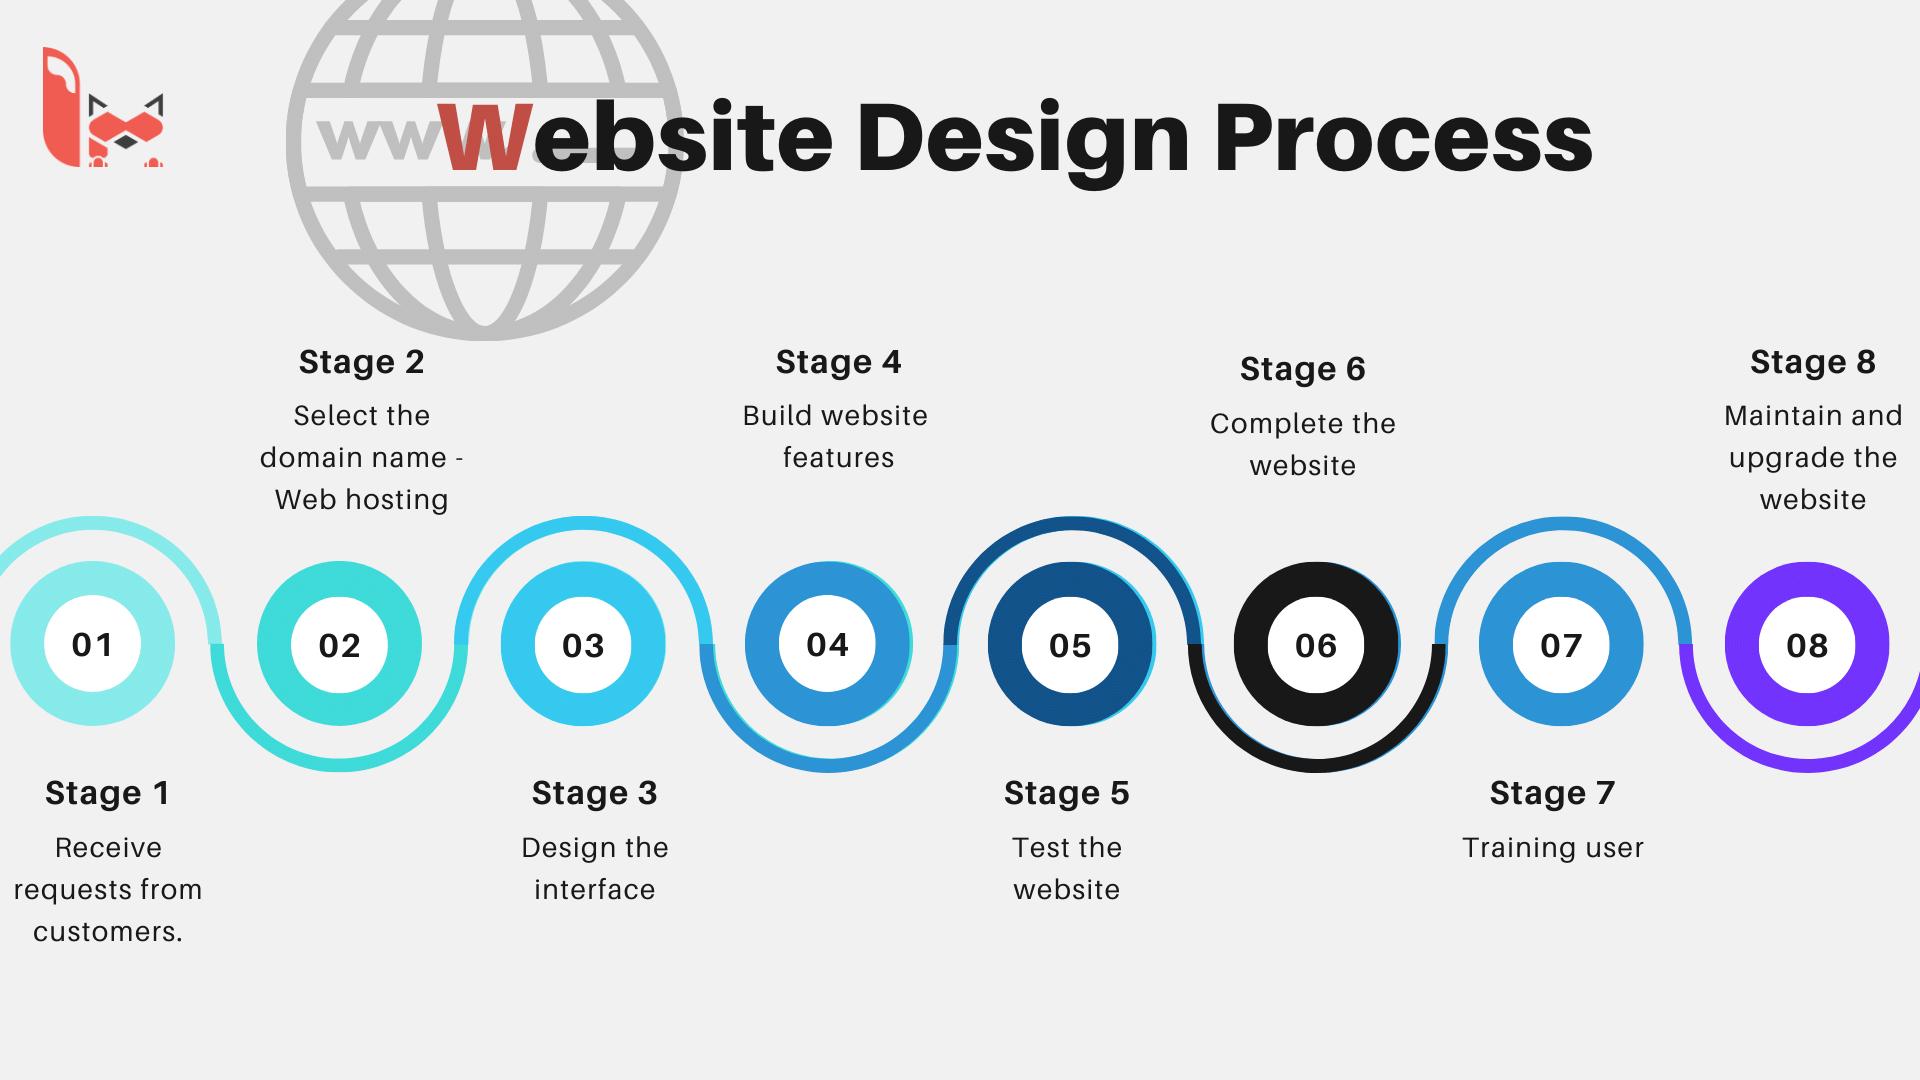 Website design process at LPTech